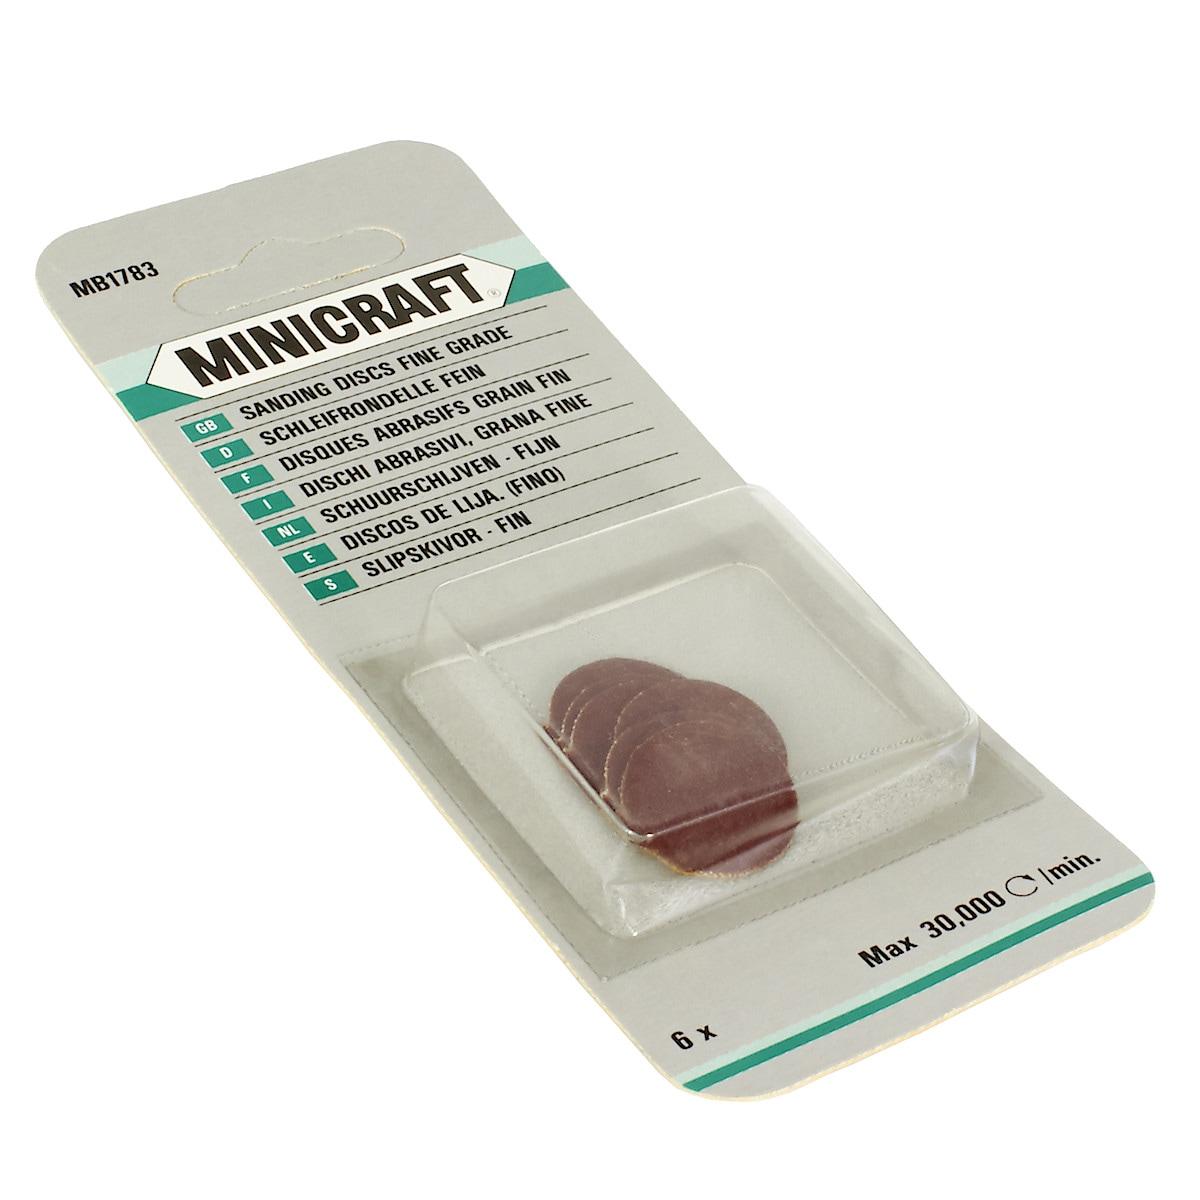 Sliperondell Minicraft MB1783, Fin